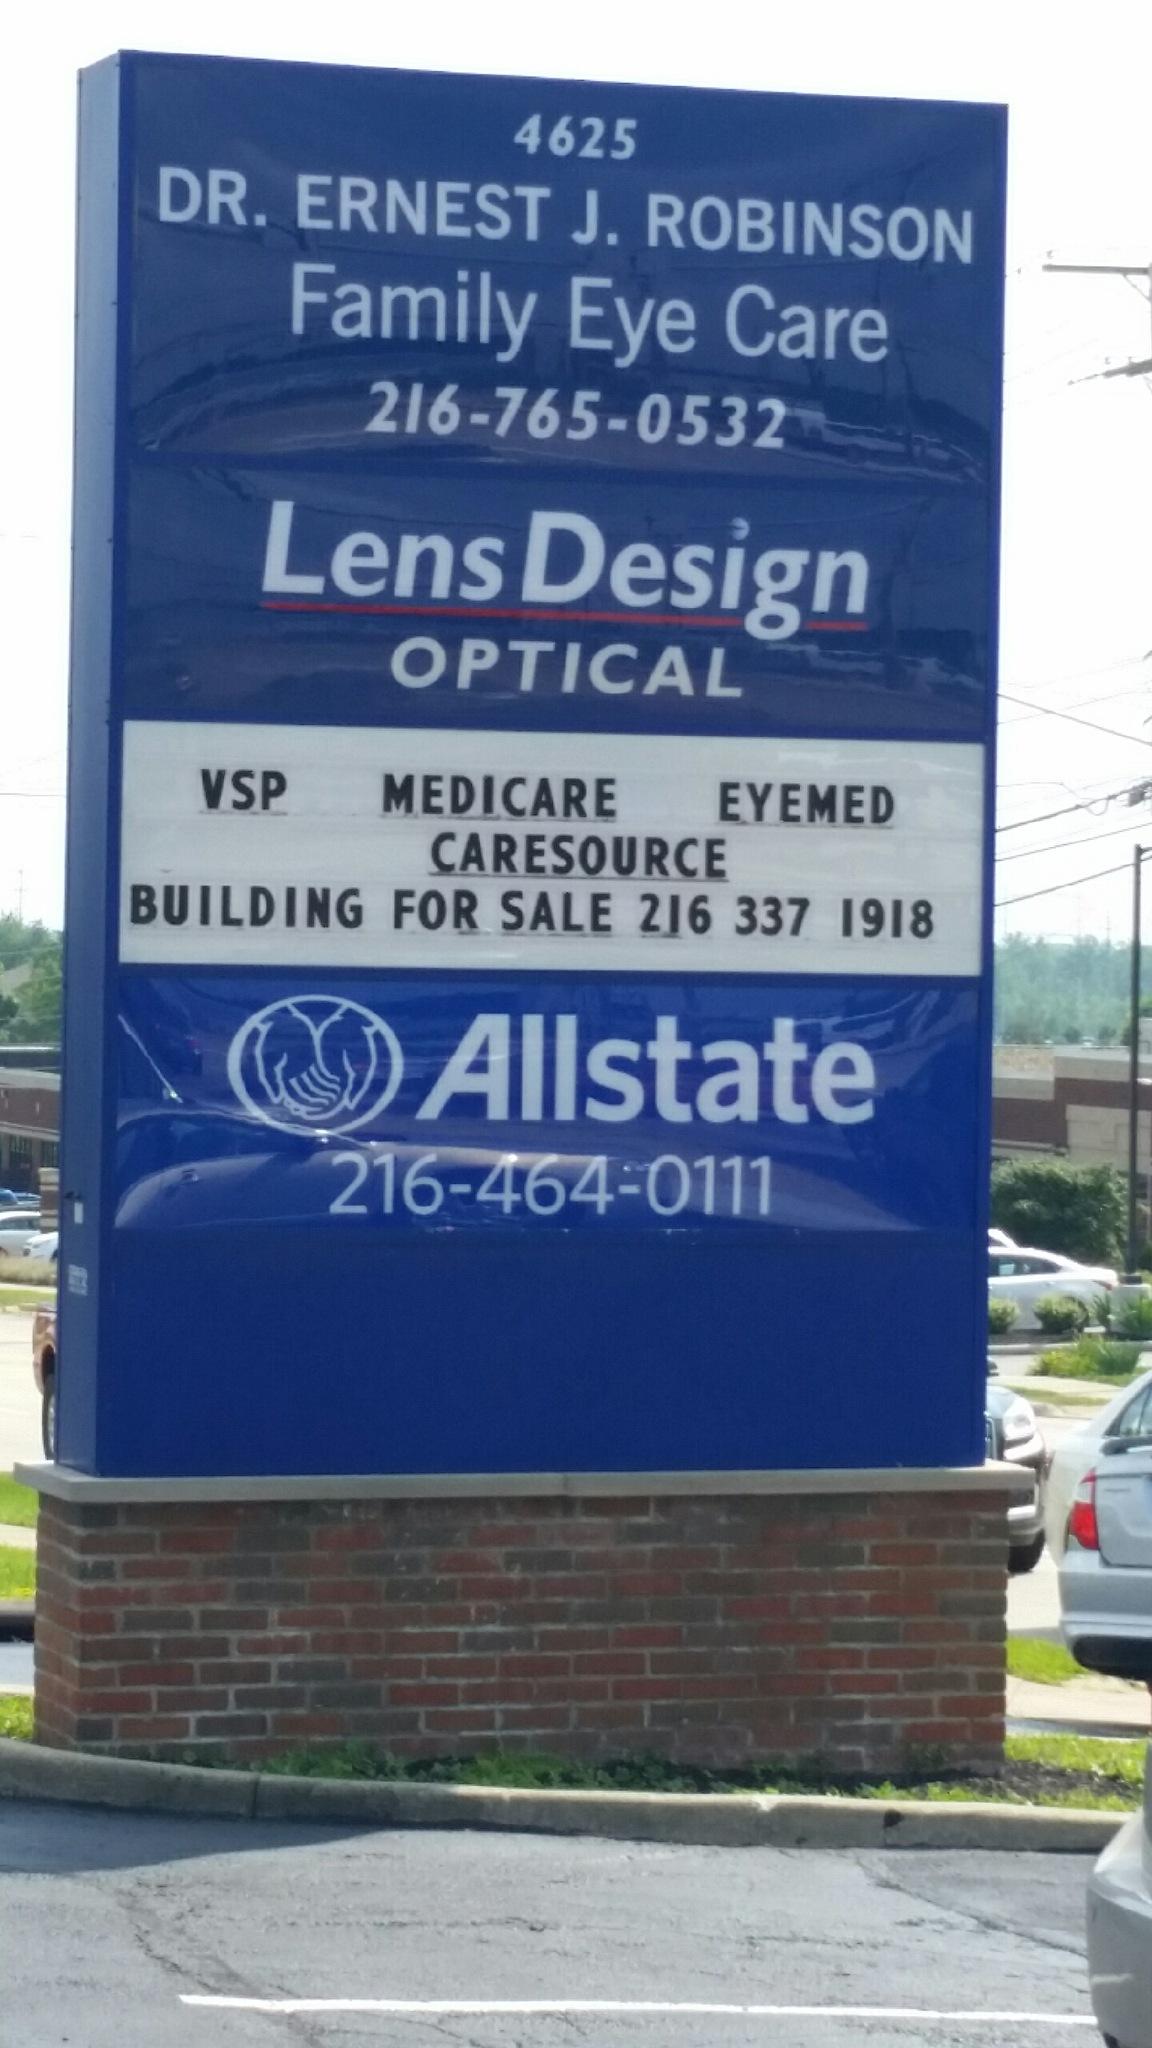 Kevin Hannah: Allstate Insurance image 1